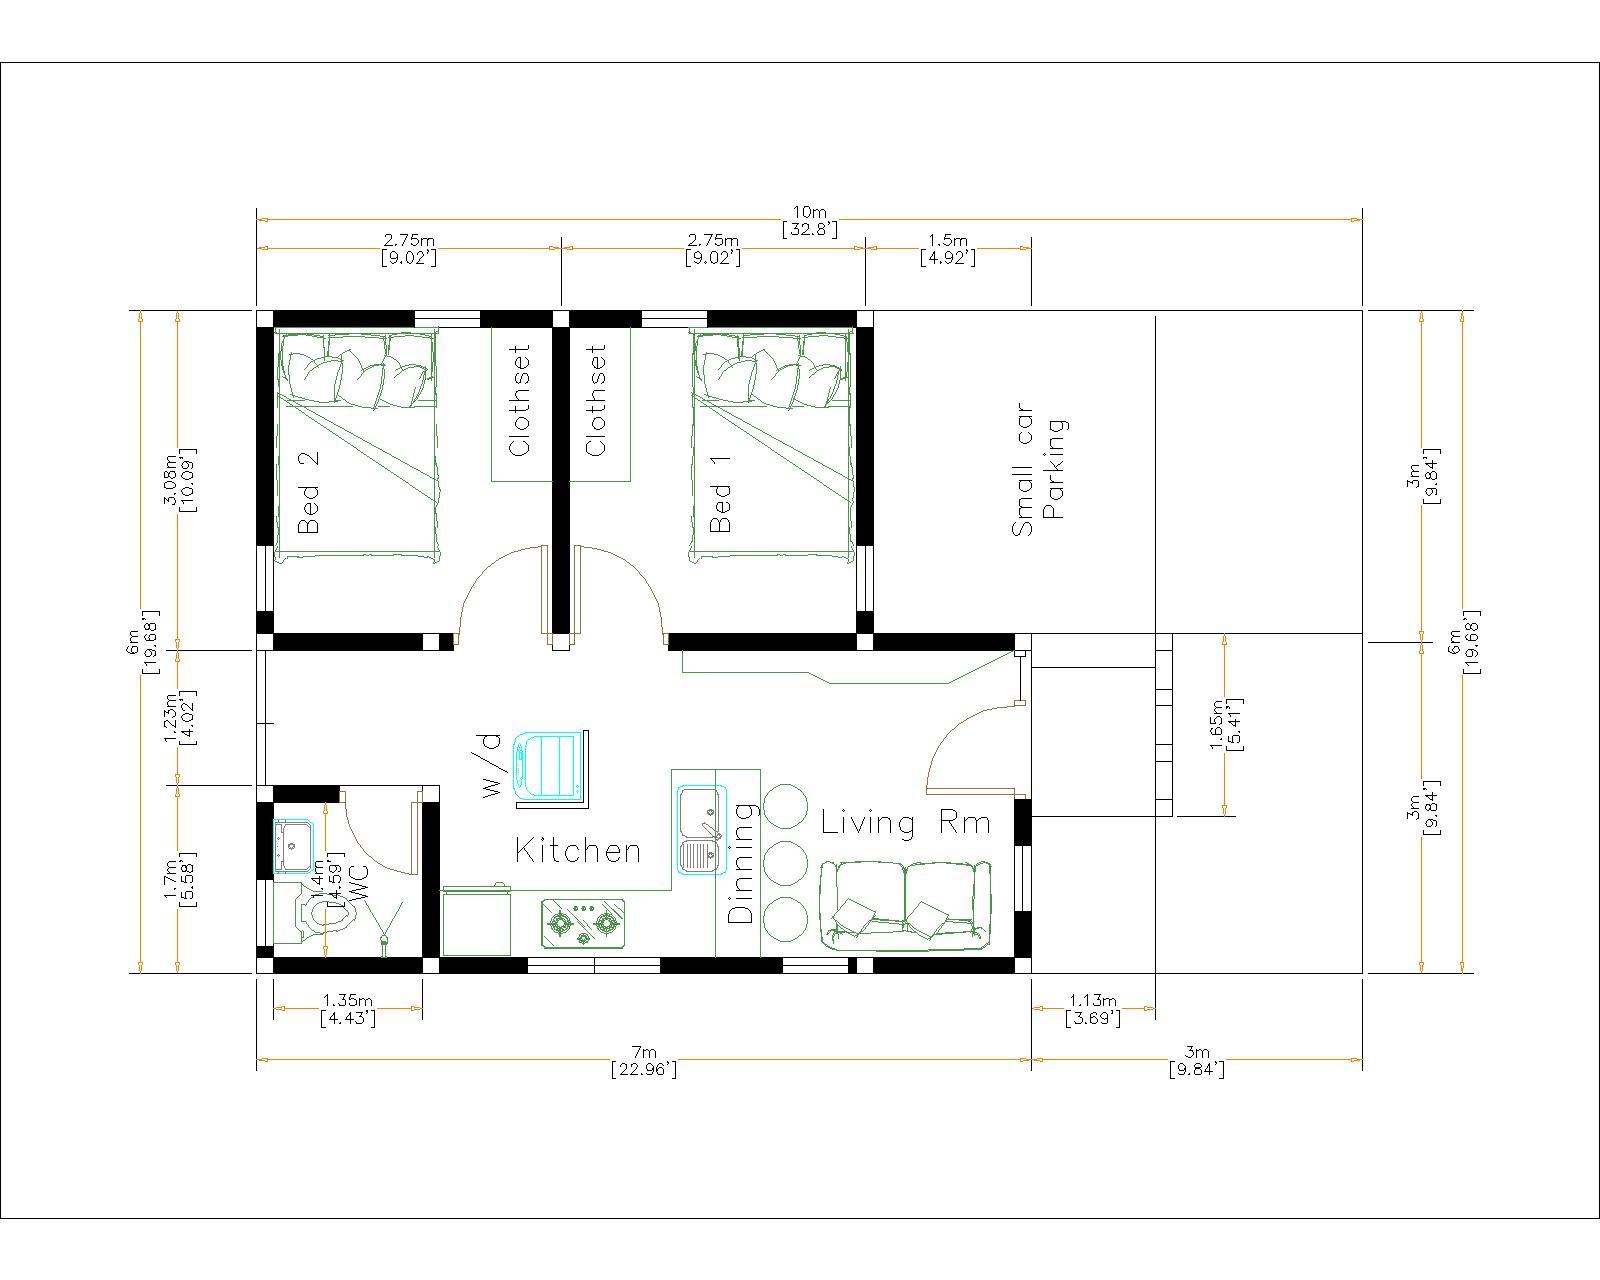 Small Budget Home 6x7Meter 20x23Feet 2 Beds layout floor plan